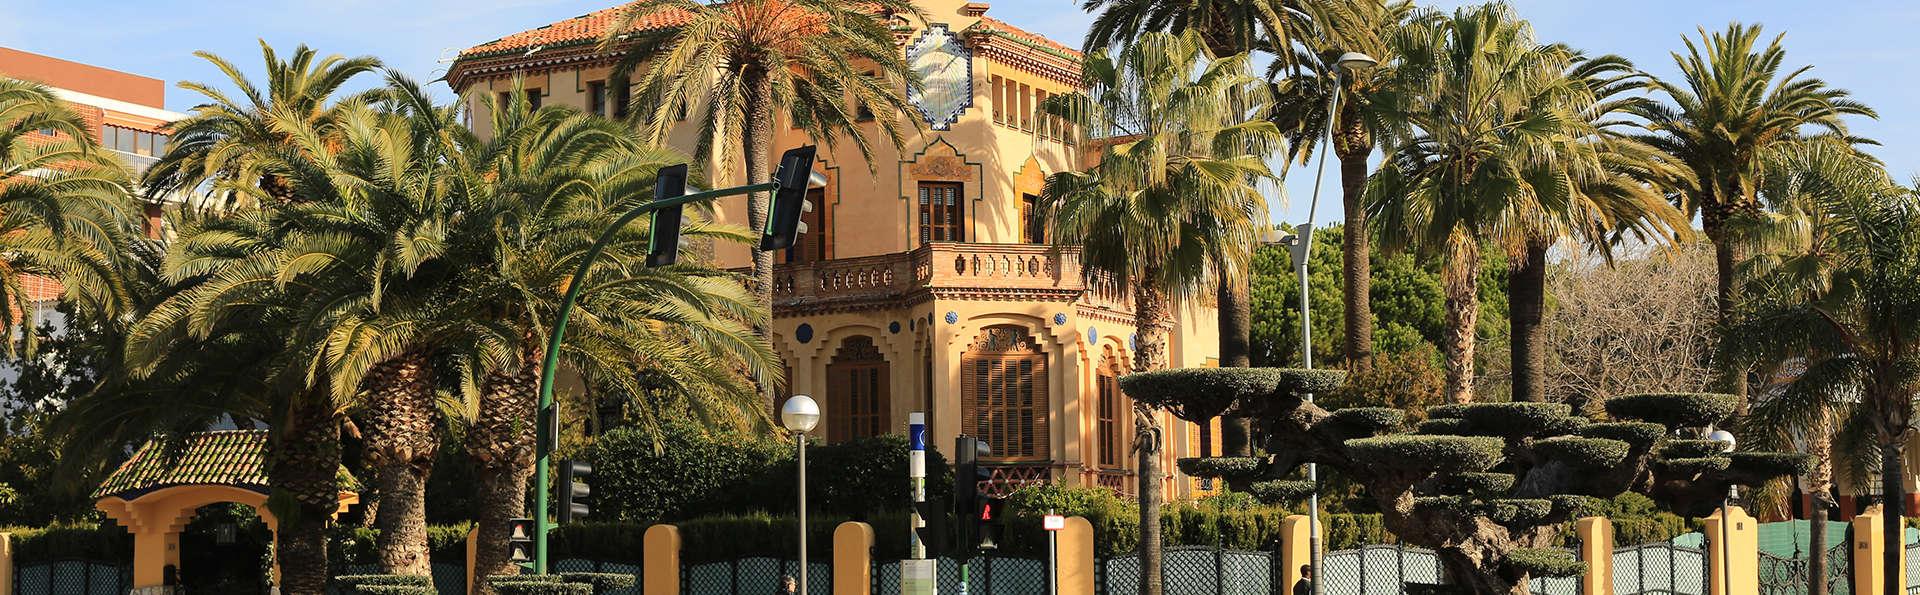 Ohtels Villa Dorada - Edit_Salou2.jpg